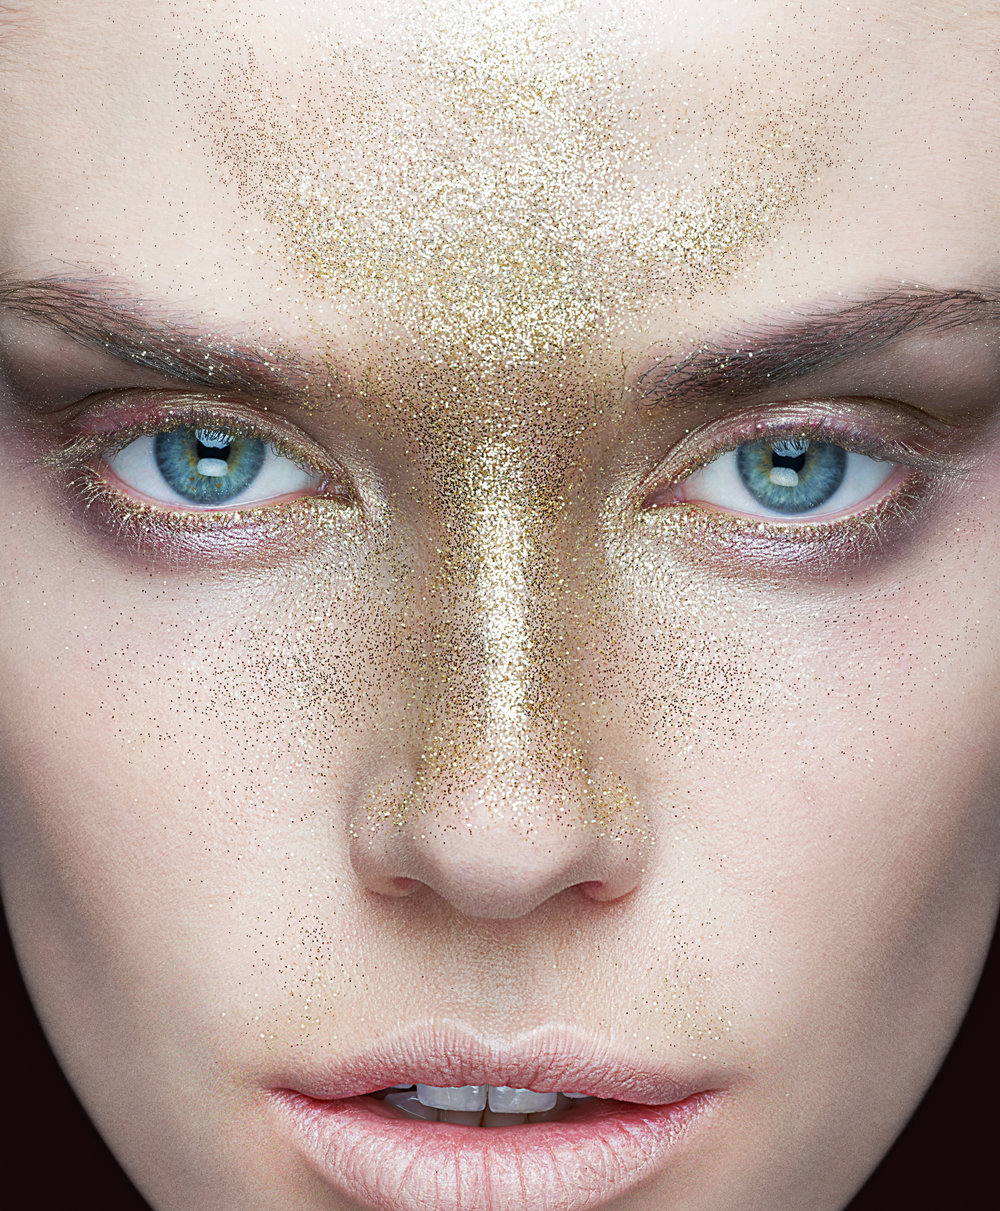 stan-musilek-photography-beauty-dior-cool-makeup